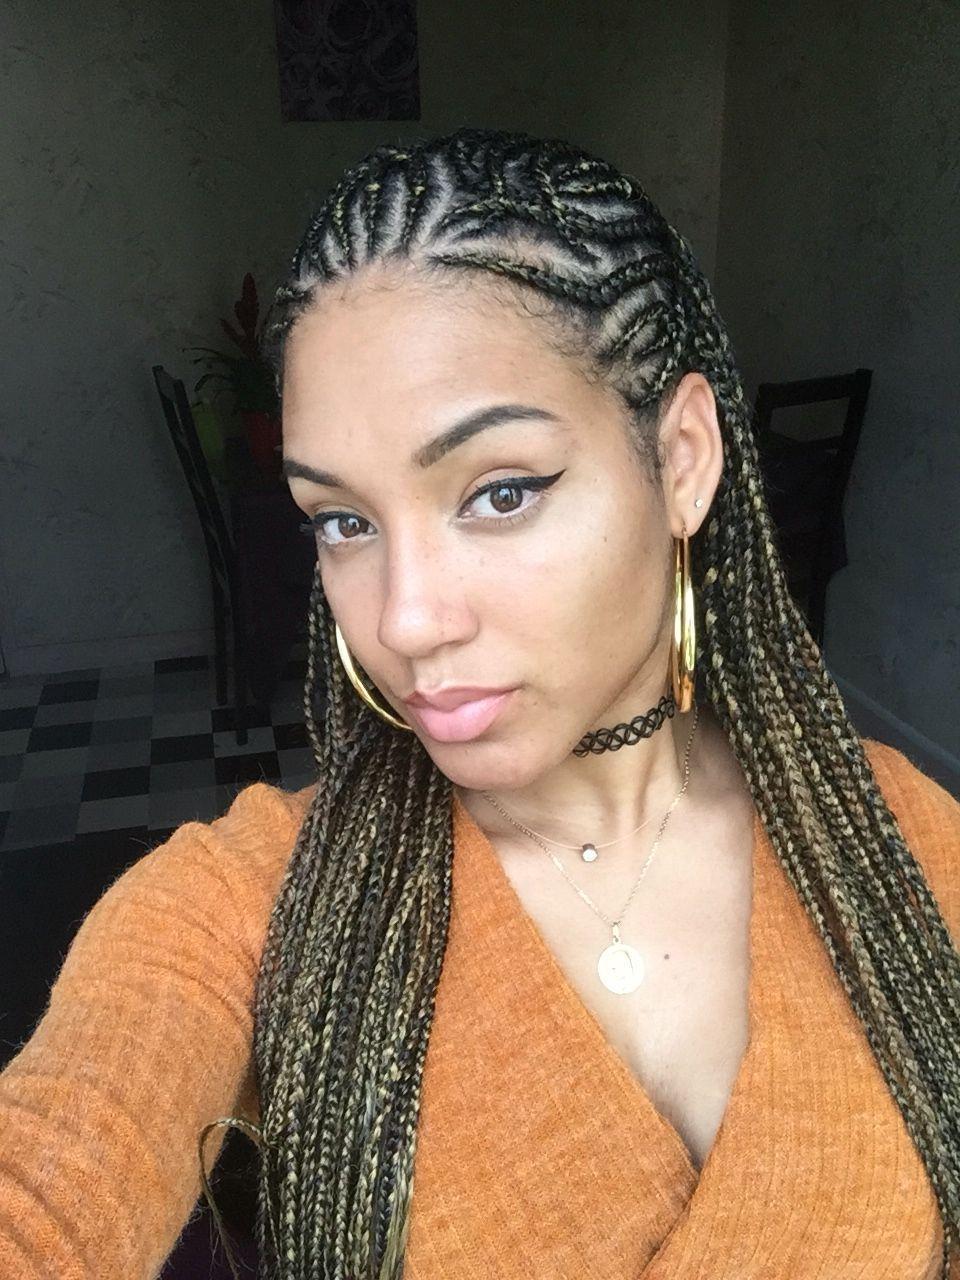 Alicia keys inspired look cornrows braids